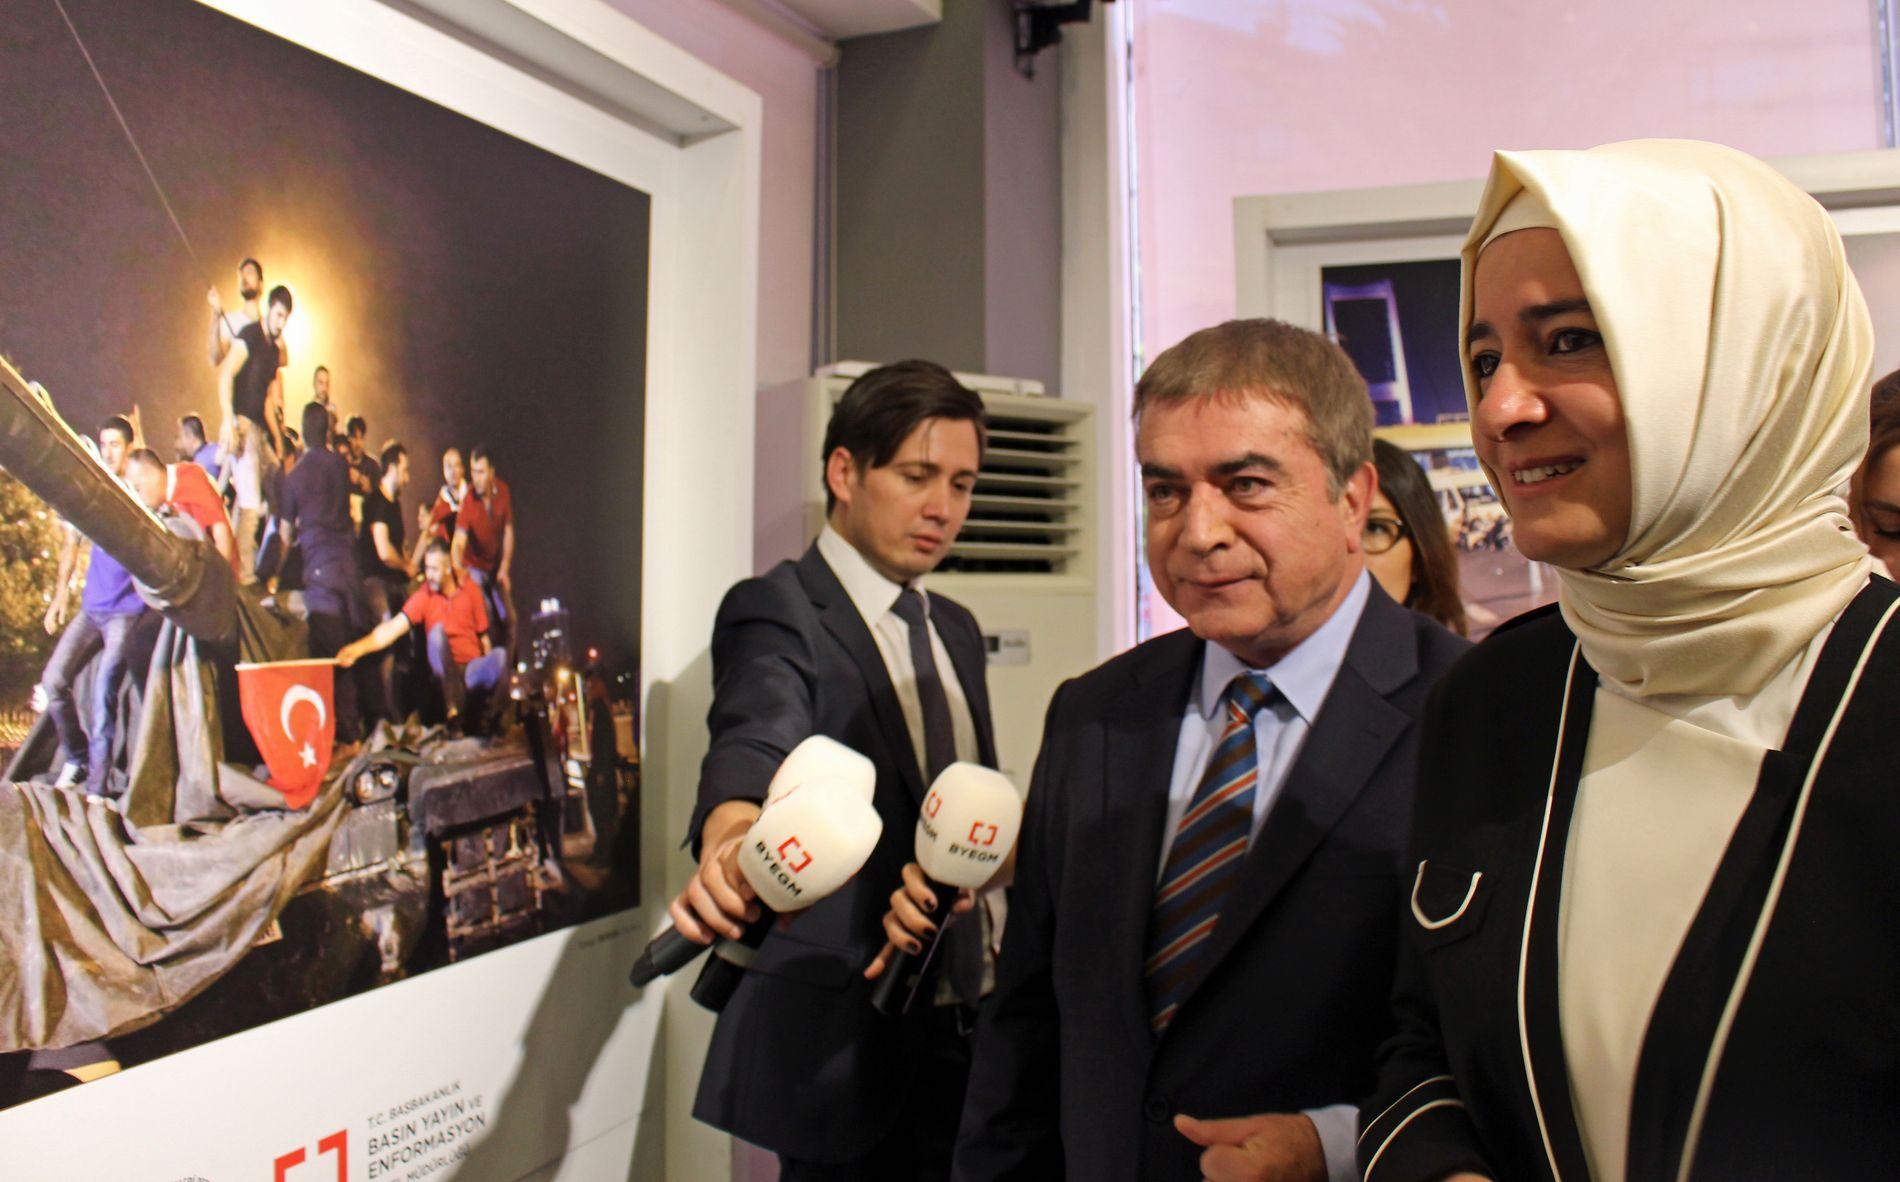 MINNES KUPPNATTEN: Fatma Betül Sayan Kaya og Mehmet Akarca i det tyrkiske pressedirektoratet, ser på en utstilling til minne om kuppforsøket i fjor.